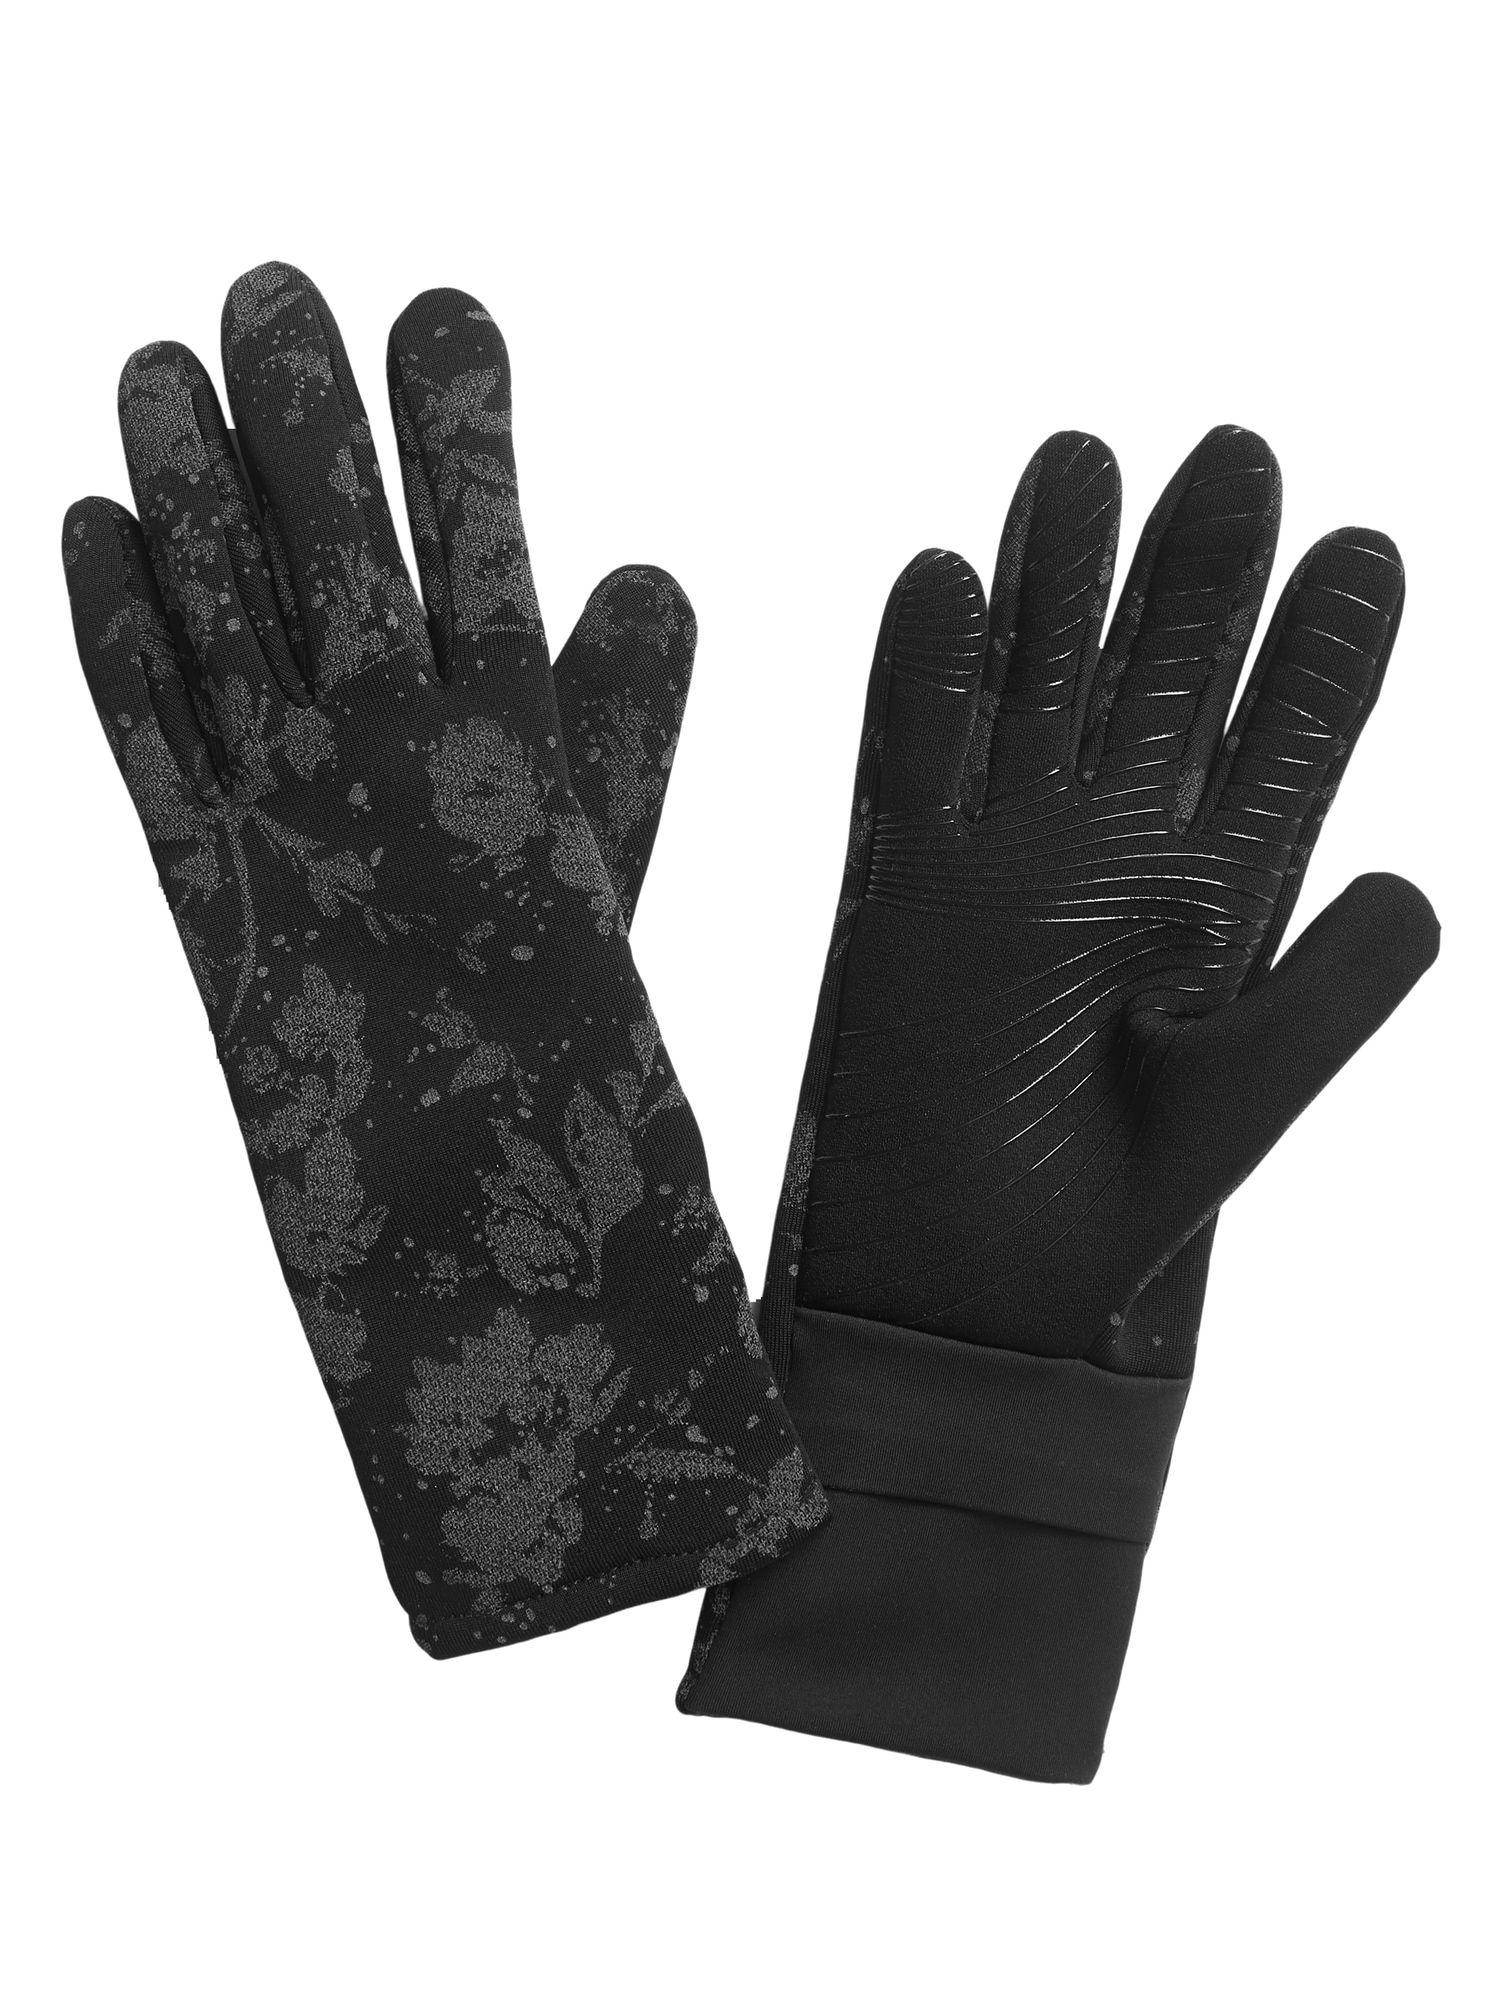 ReflecToes Reflective Running Gloves Lightweight Hi Vis Winter Running Gear Cold Weather Jogging at Night Touchscreen